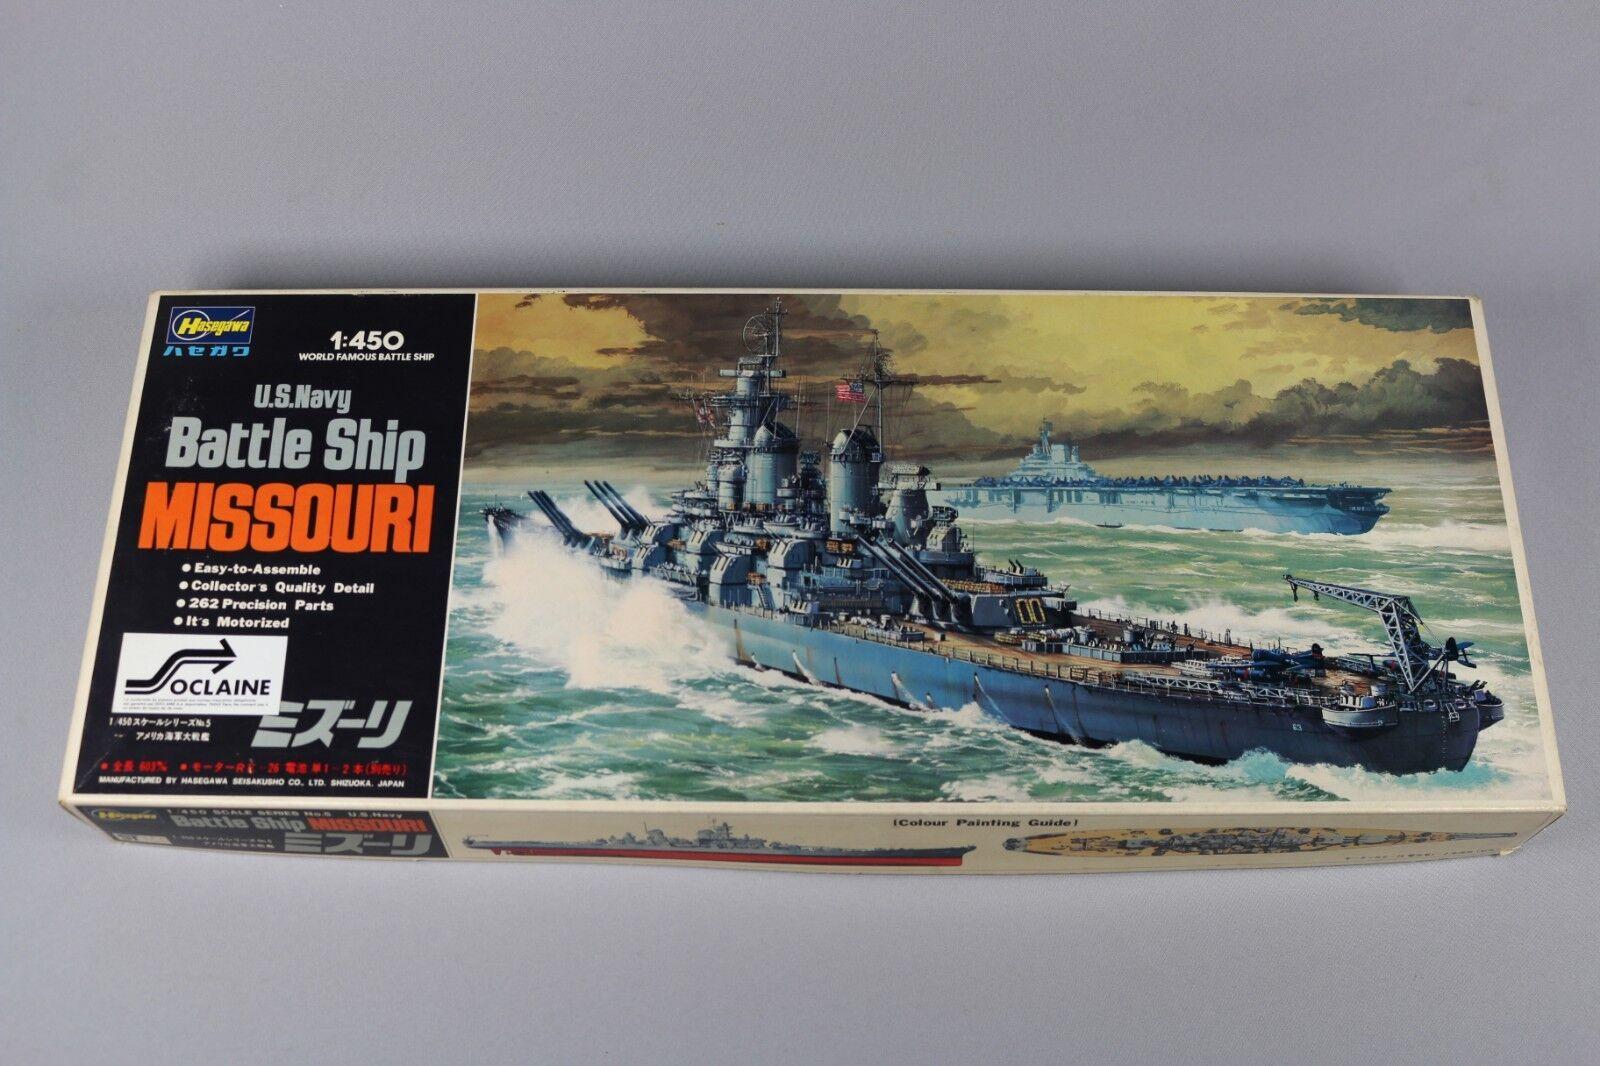 Zf041 Hasegawa 1 450 Maqueta Barco 40005 Z5 Us Navy Battle Ship Missouri 1980